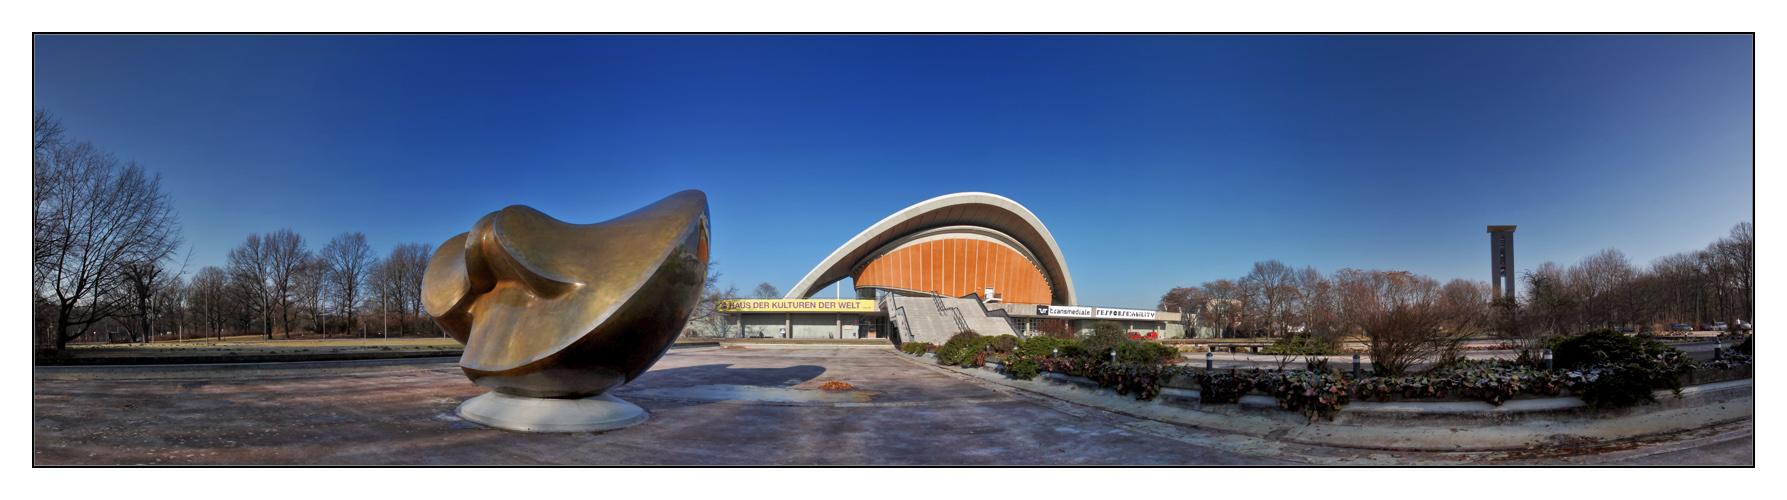 Schwangere Auster - Haus der Kulturen der Welt